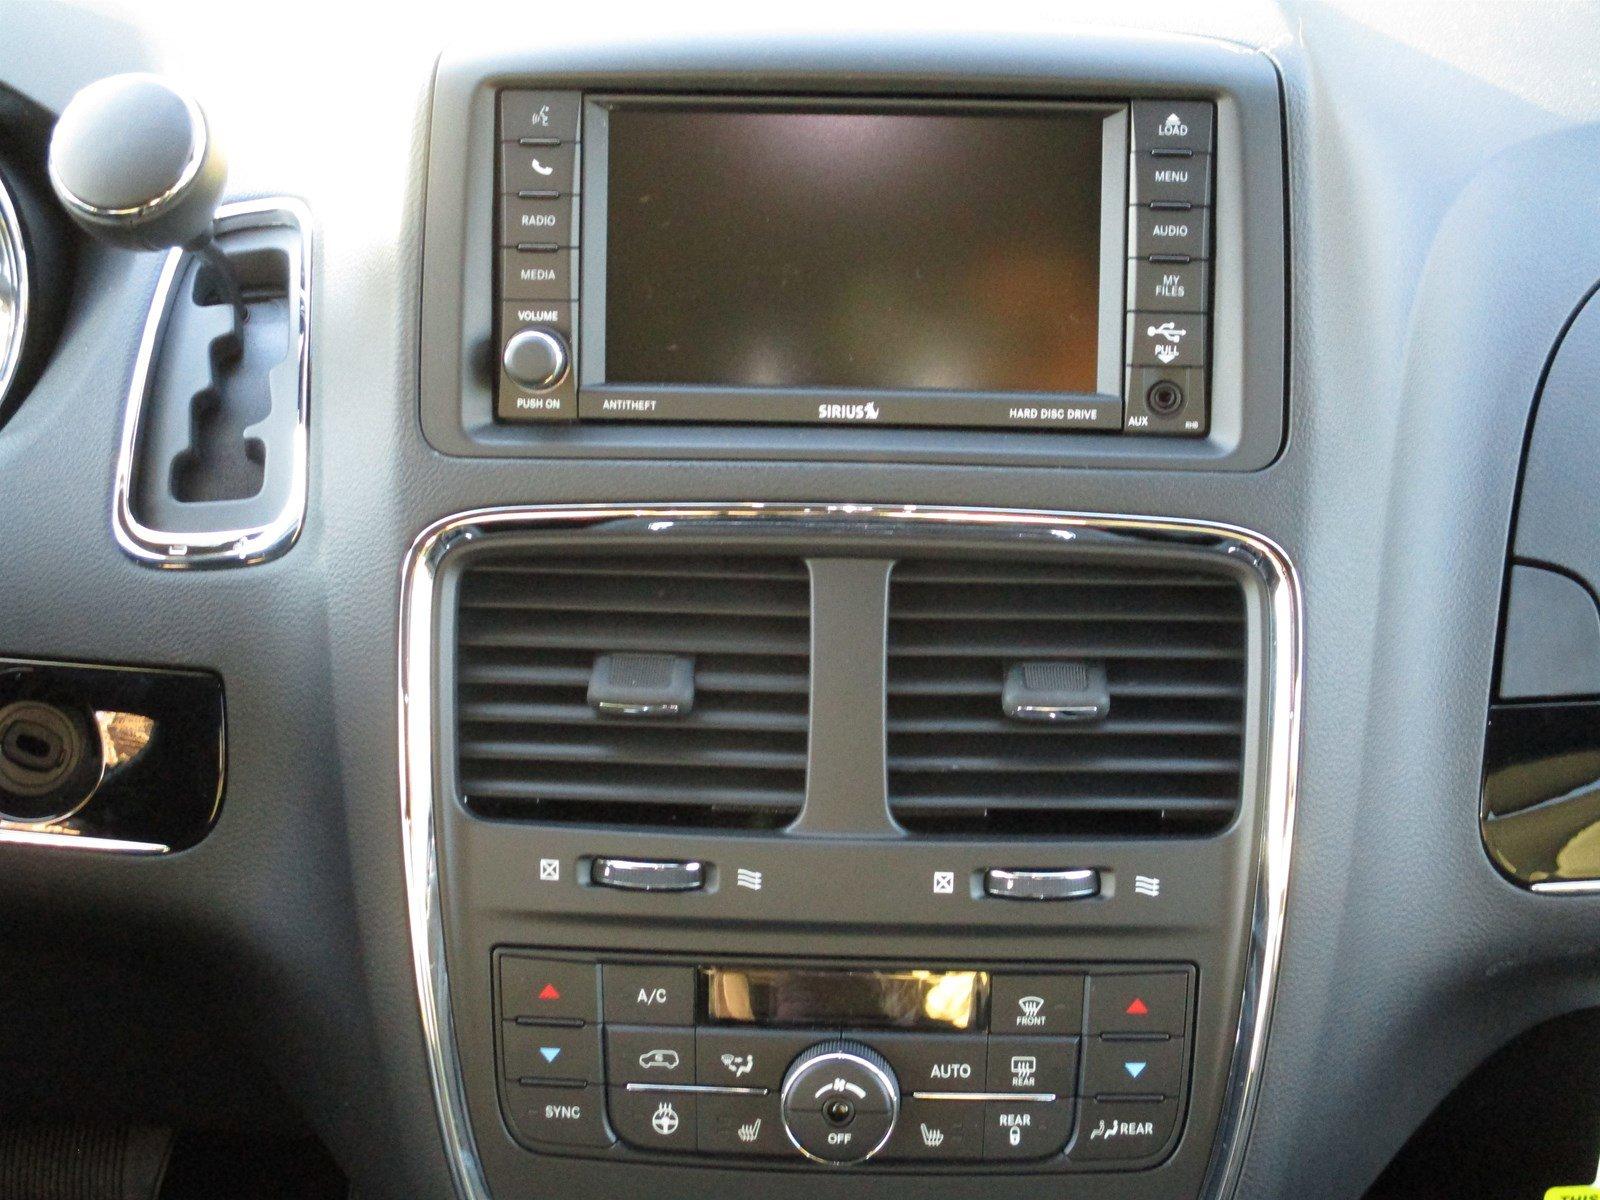 New 2019 Dodge Grand Caravan SXT 35th Anniversary Edition Wagon